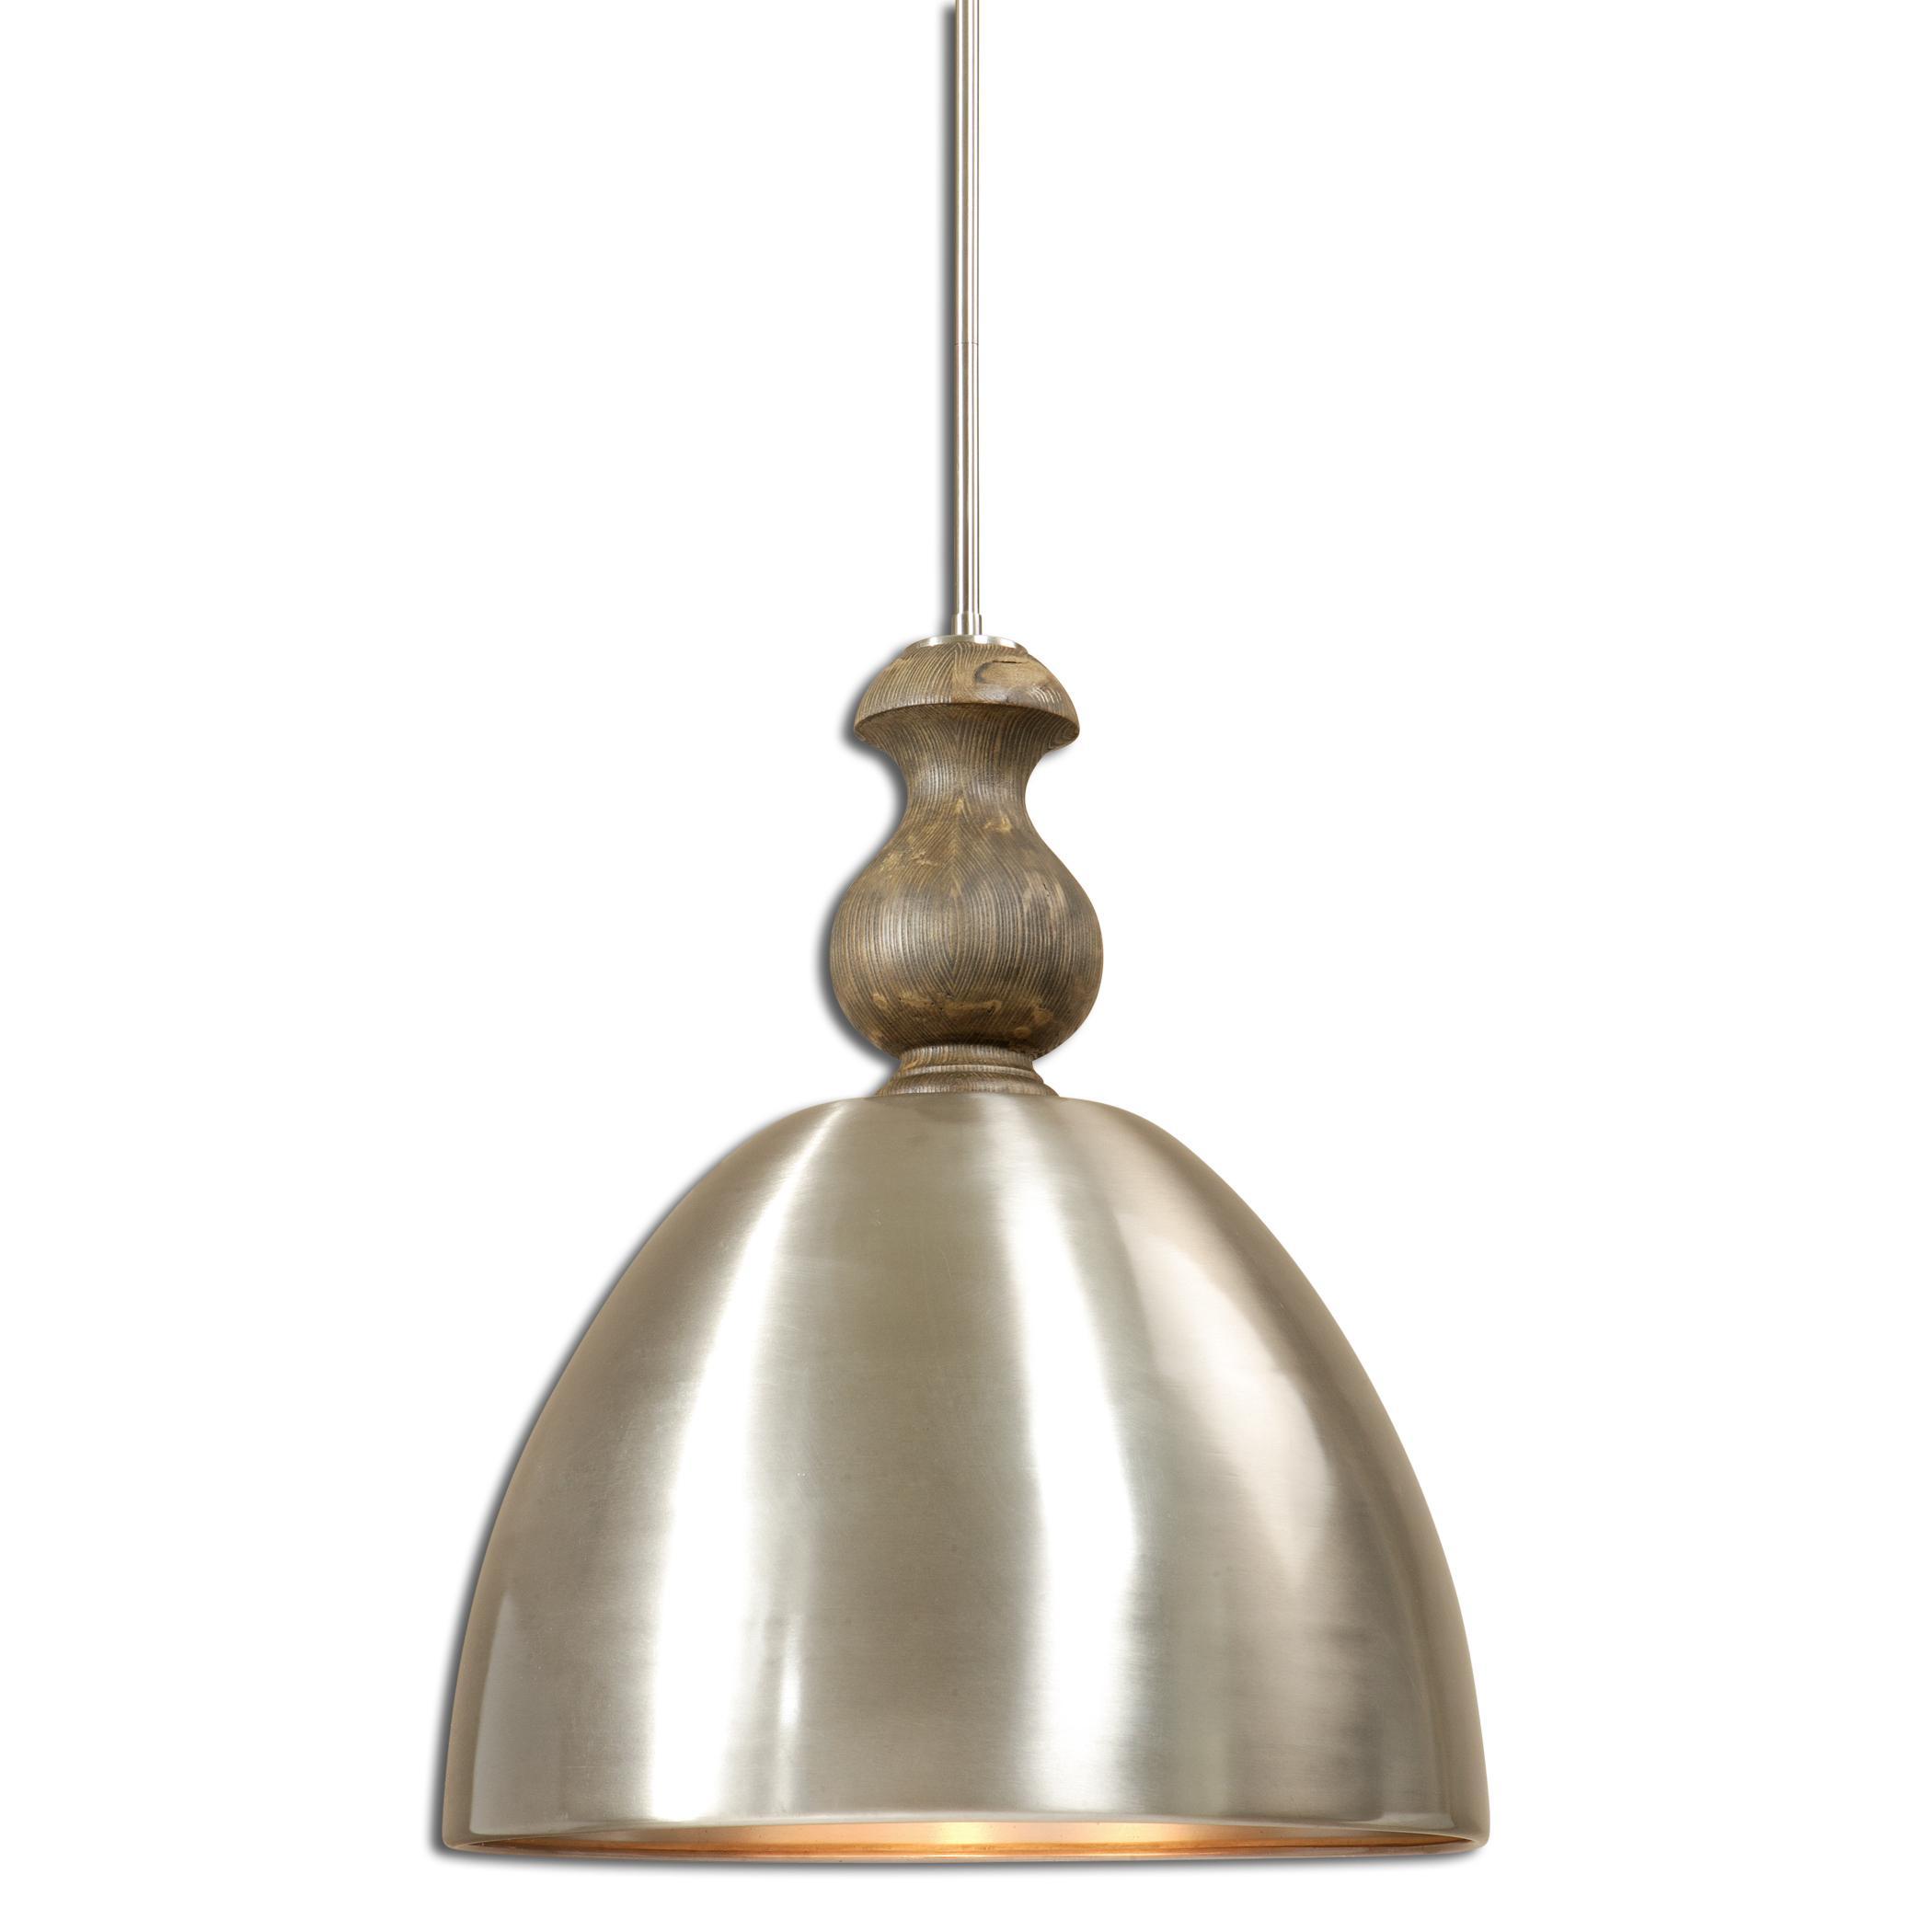 Uttermost Lighting Fixtures Luna 3 Light Aluminum Pendant - Item Number: 22042